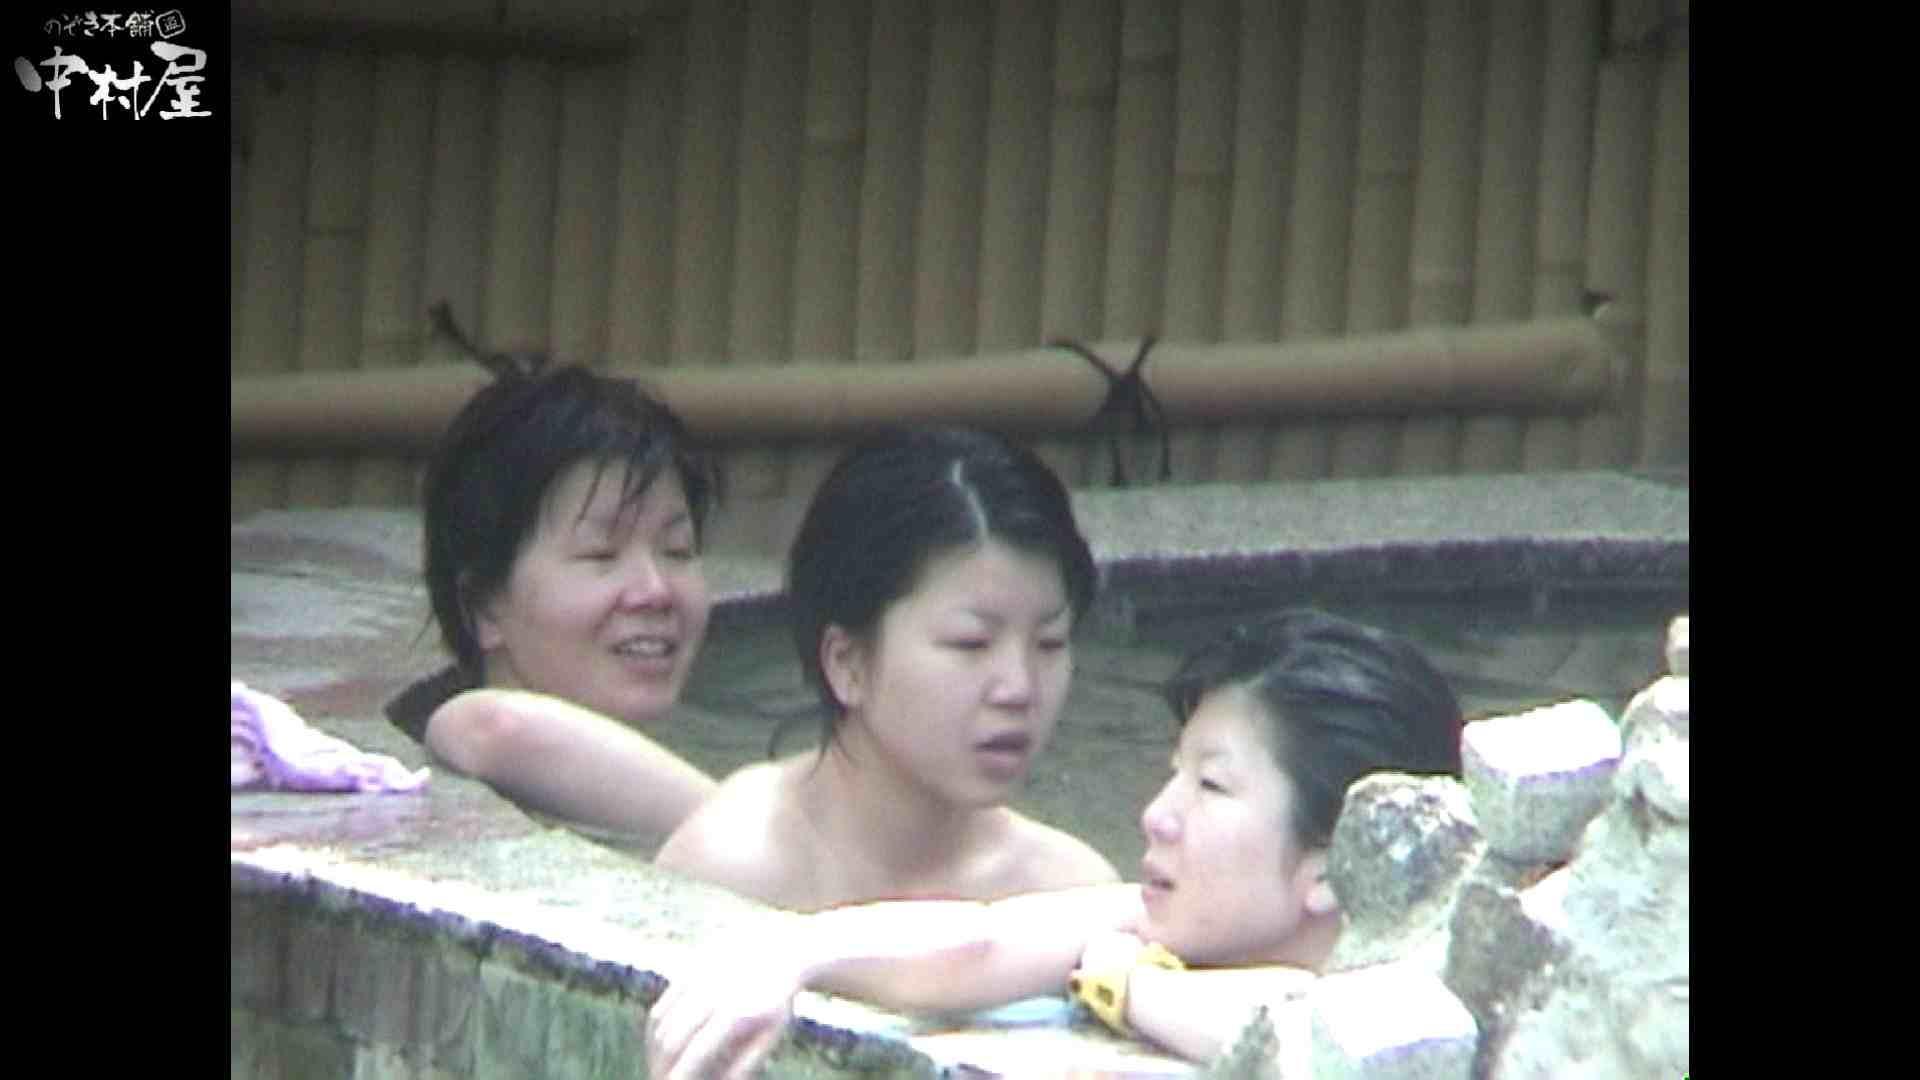 Aquaな露天風呂Vol.936 盗撮シリーズ | 露天風呂編  90PIX 49